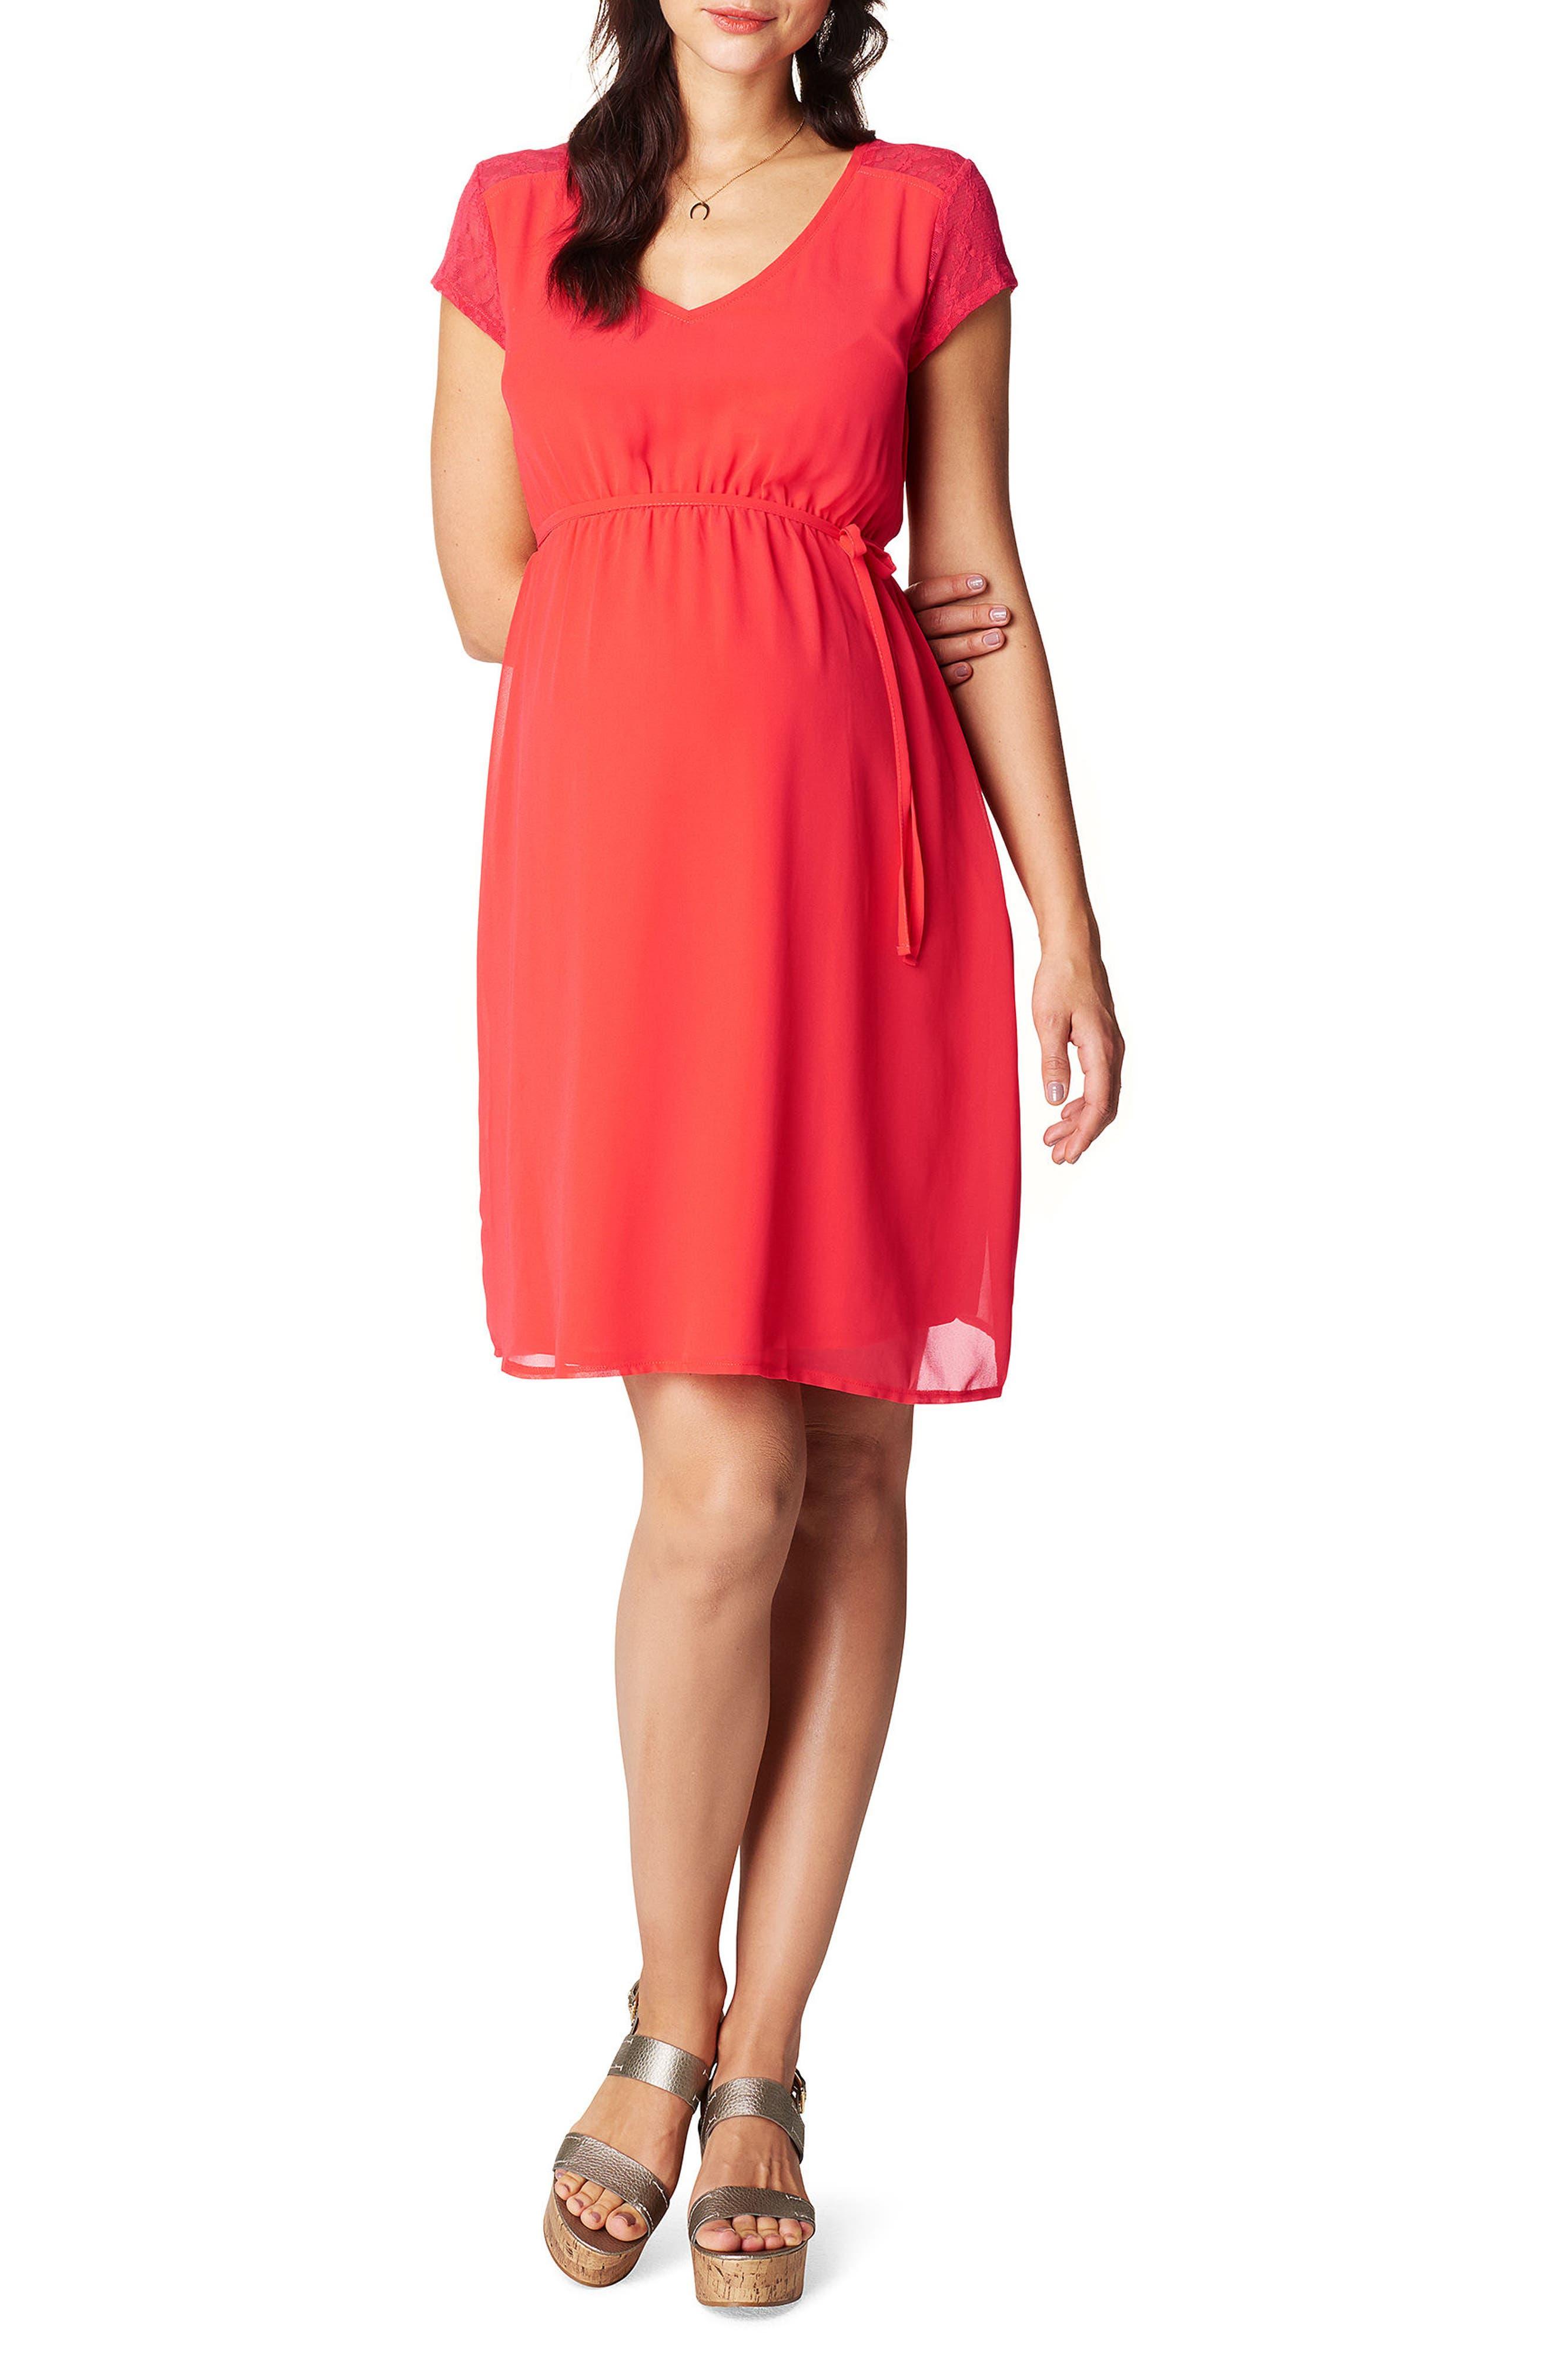 Noelle Maternity Dress,                             Main thumbnail 1, color,                             RED